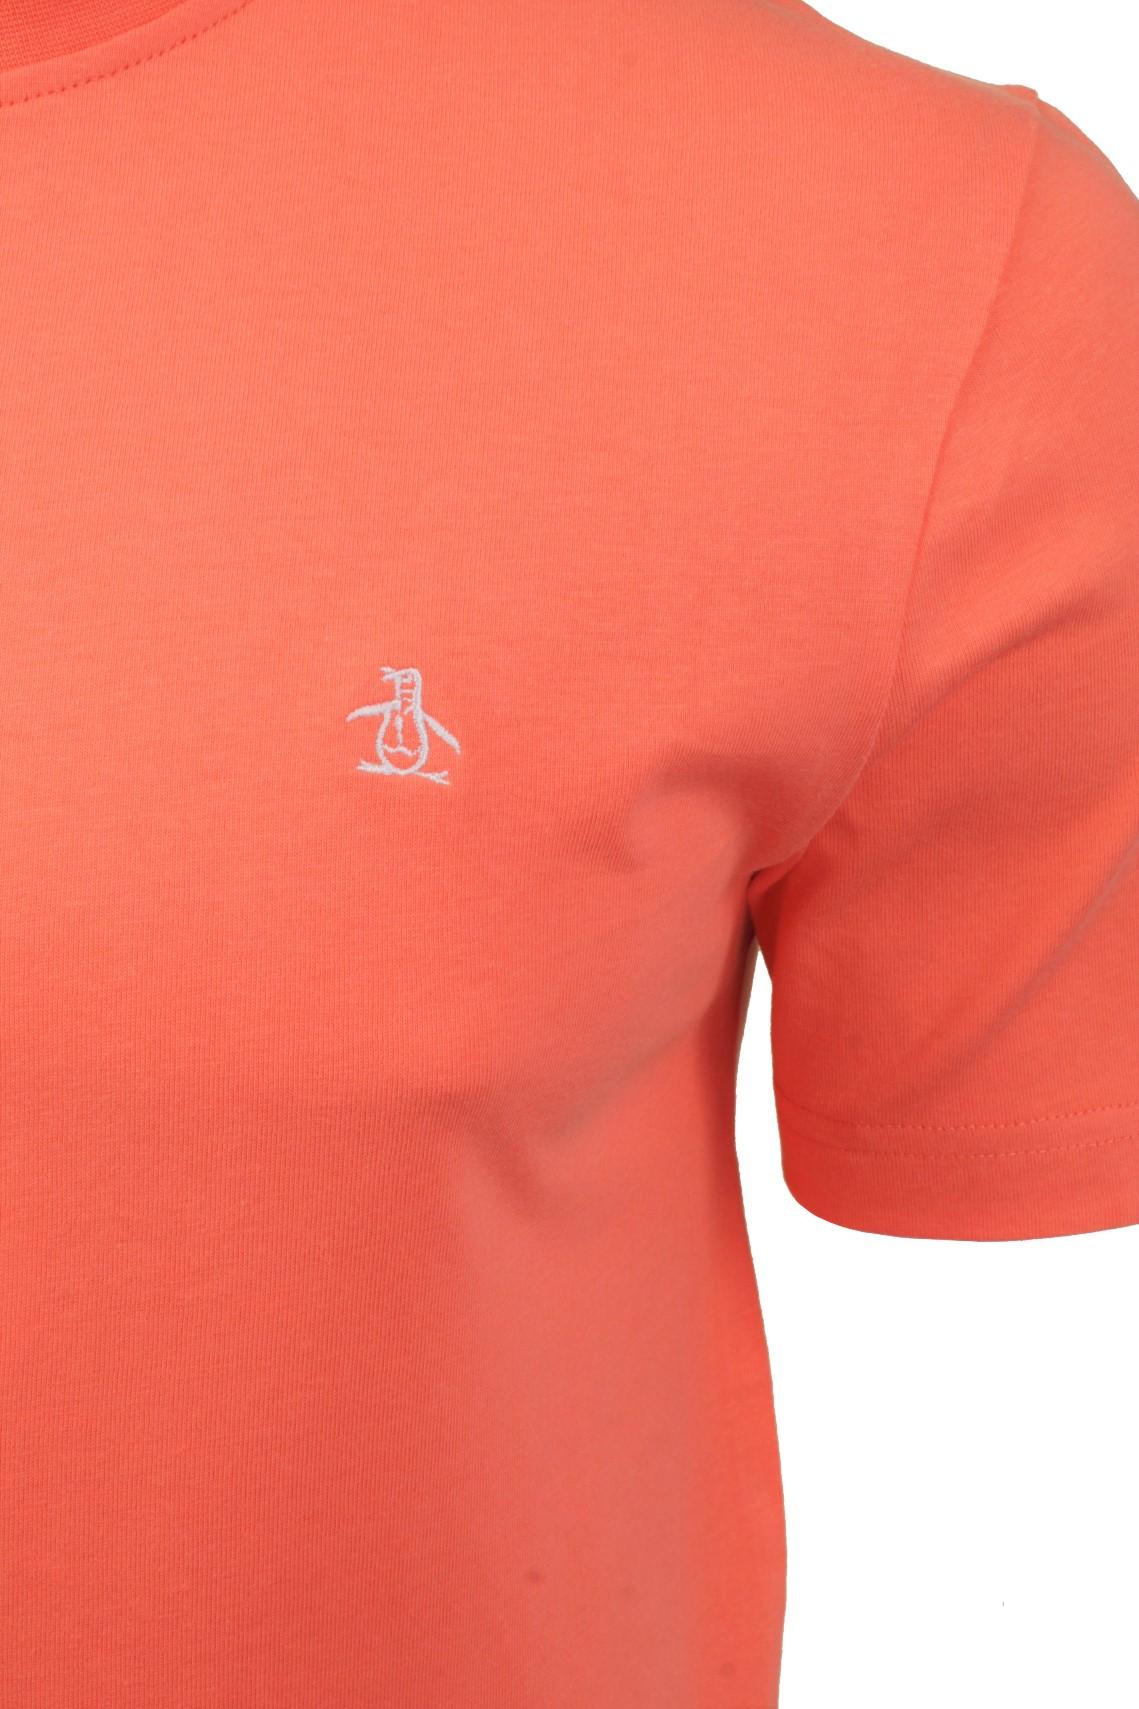 Mens-T-Shirt-by-Original-Penguin-Crew-Neck-Short-Sleeved thumbnail 31